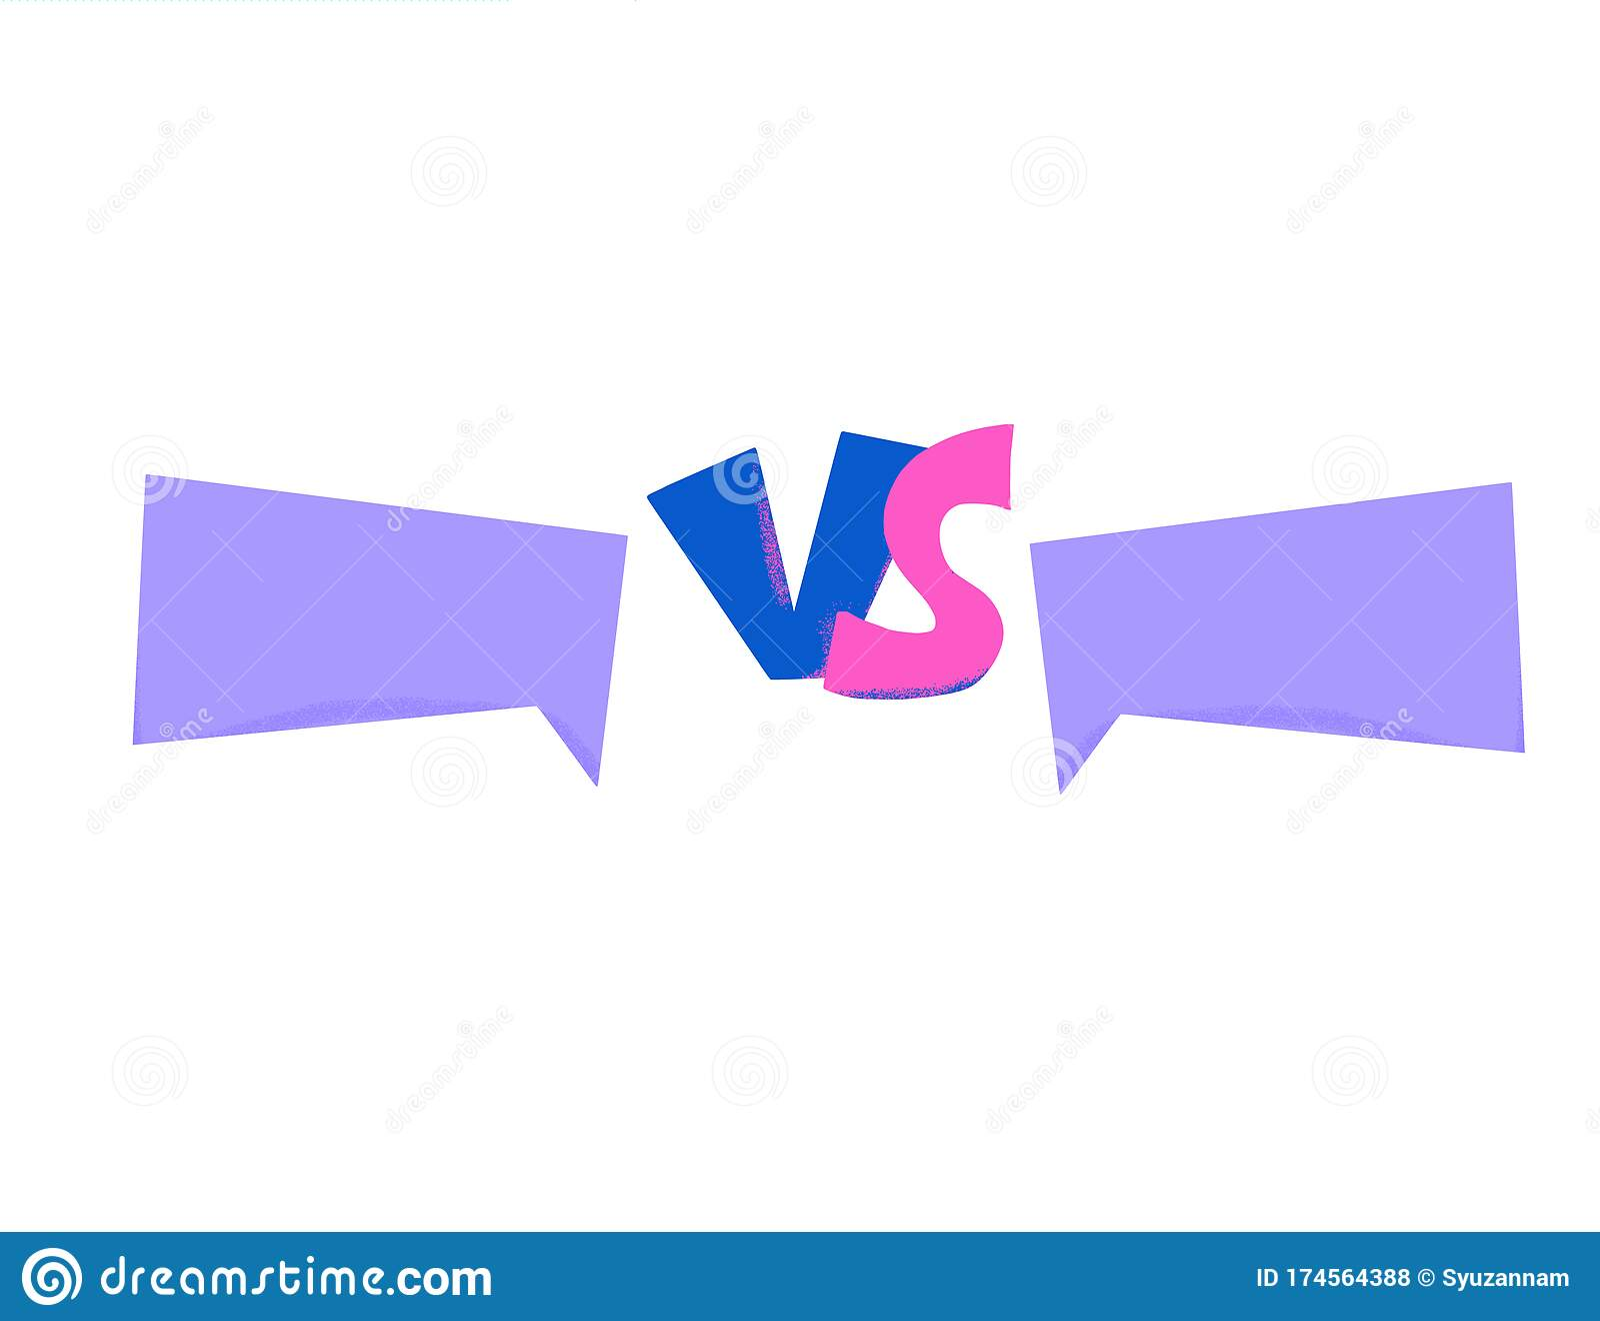 Vs Screen Versus Vector Sign With Copy Space Stock Vector